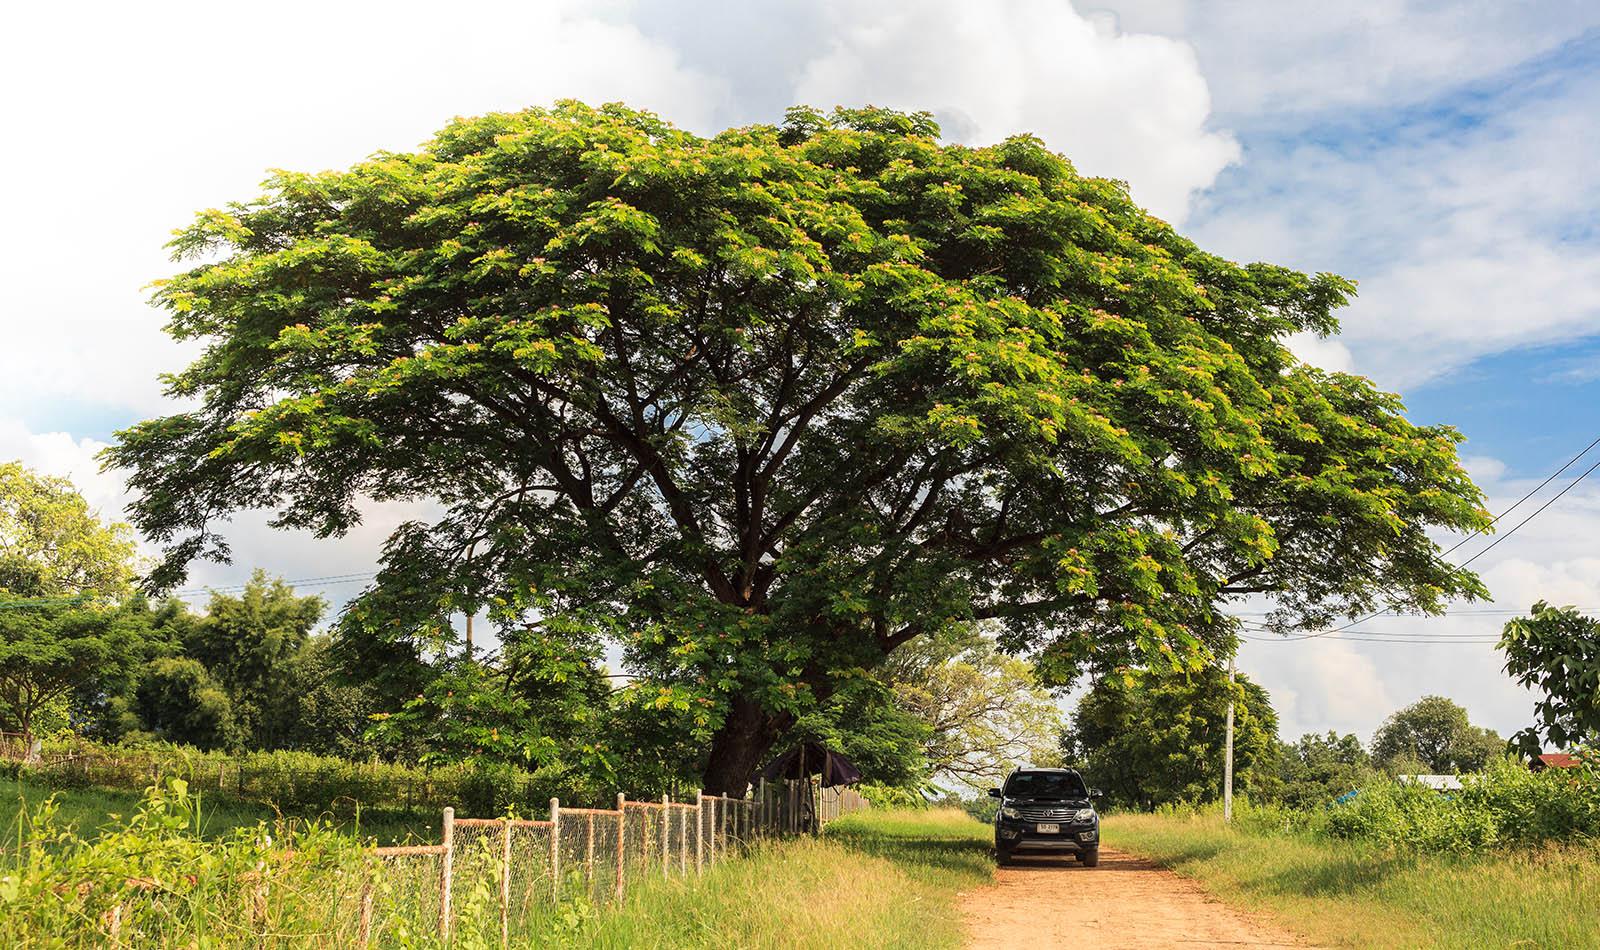 Suar wood tree or rain tree in Thailand.